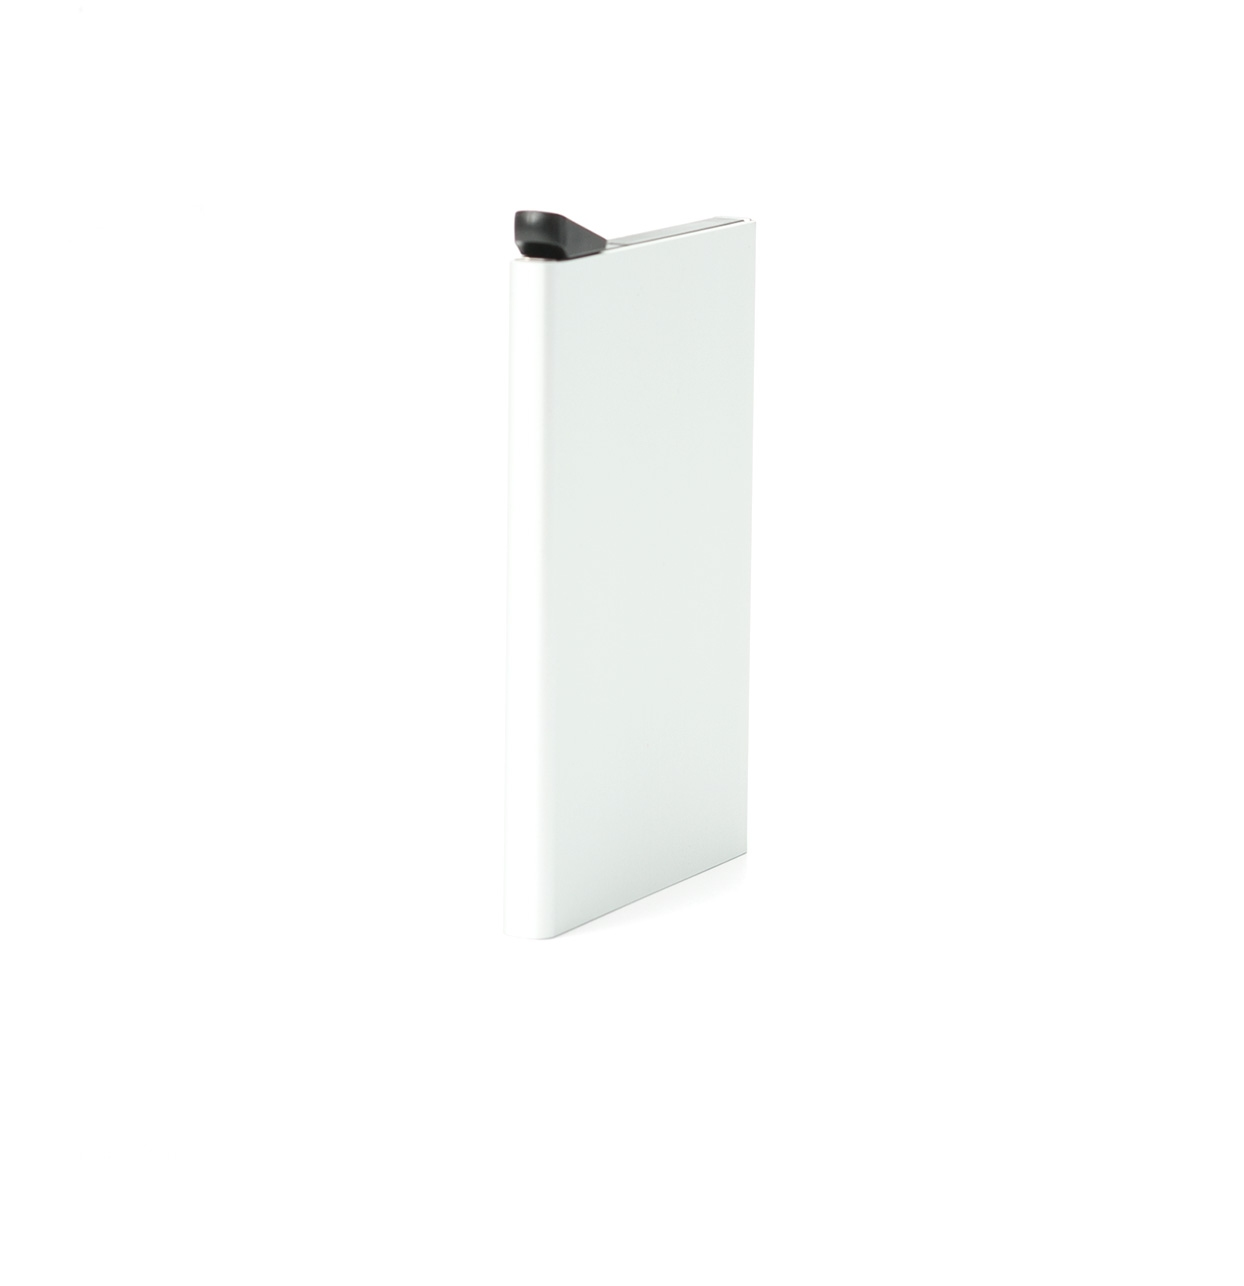 Secrid slim wallet con cardprotector de aluminio ultrafino, color aluminio. - Ítem1